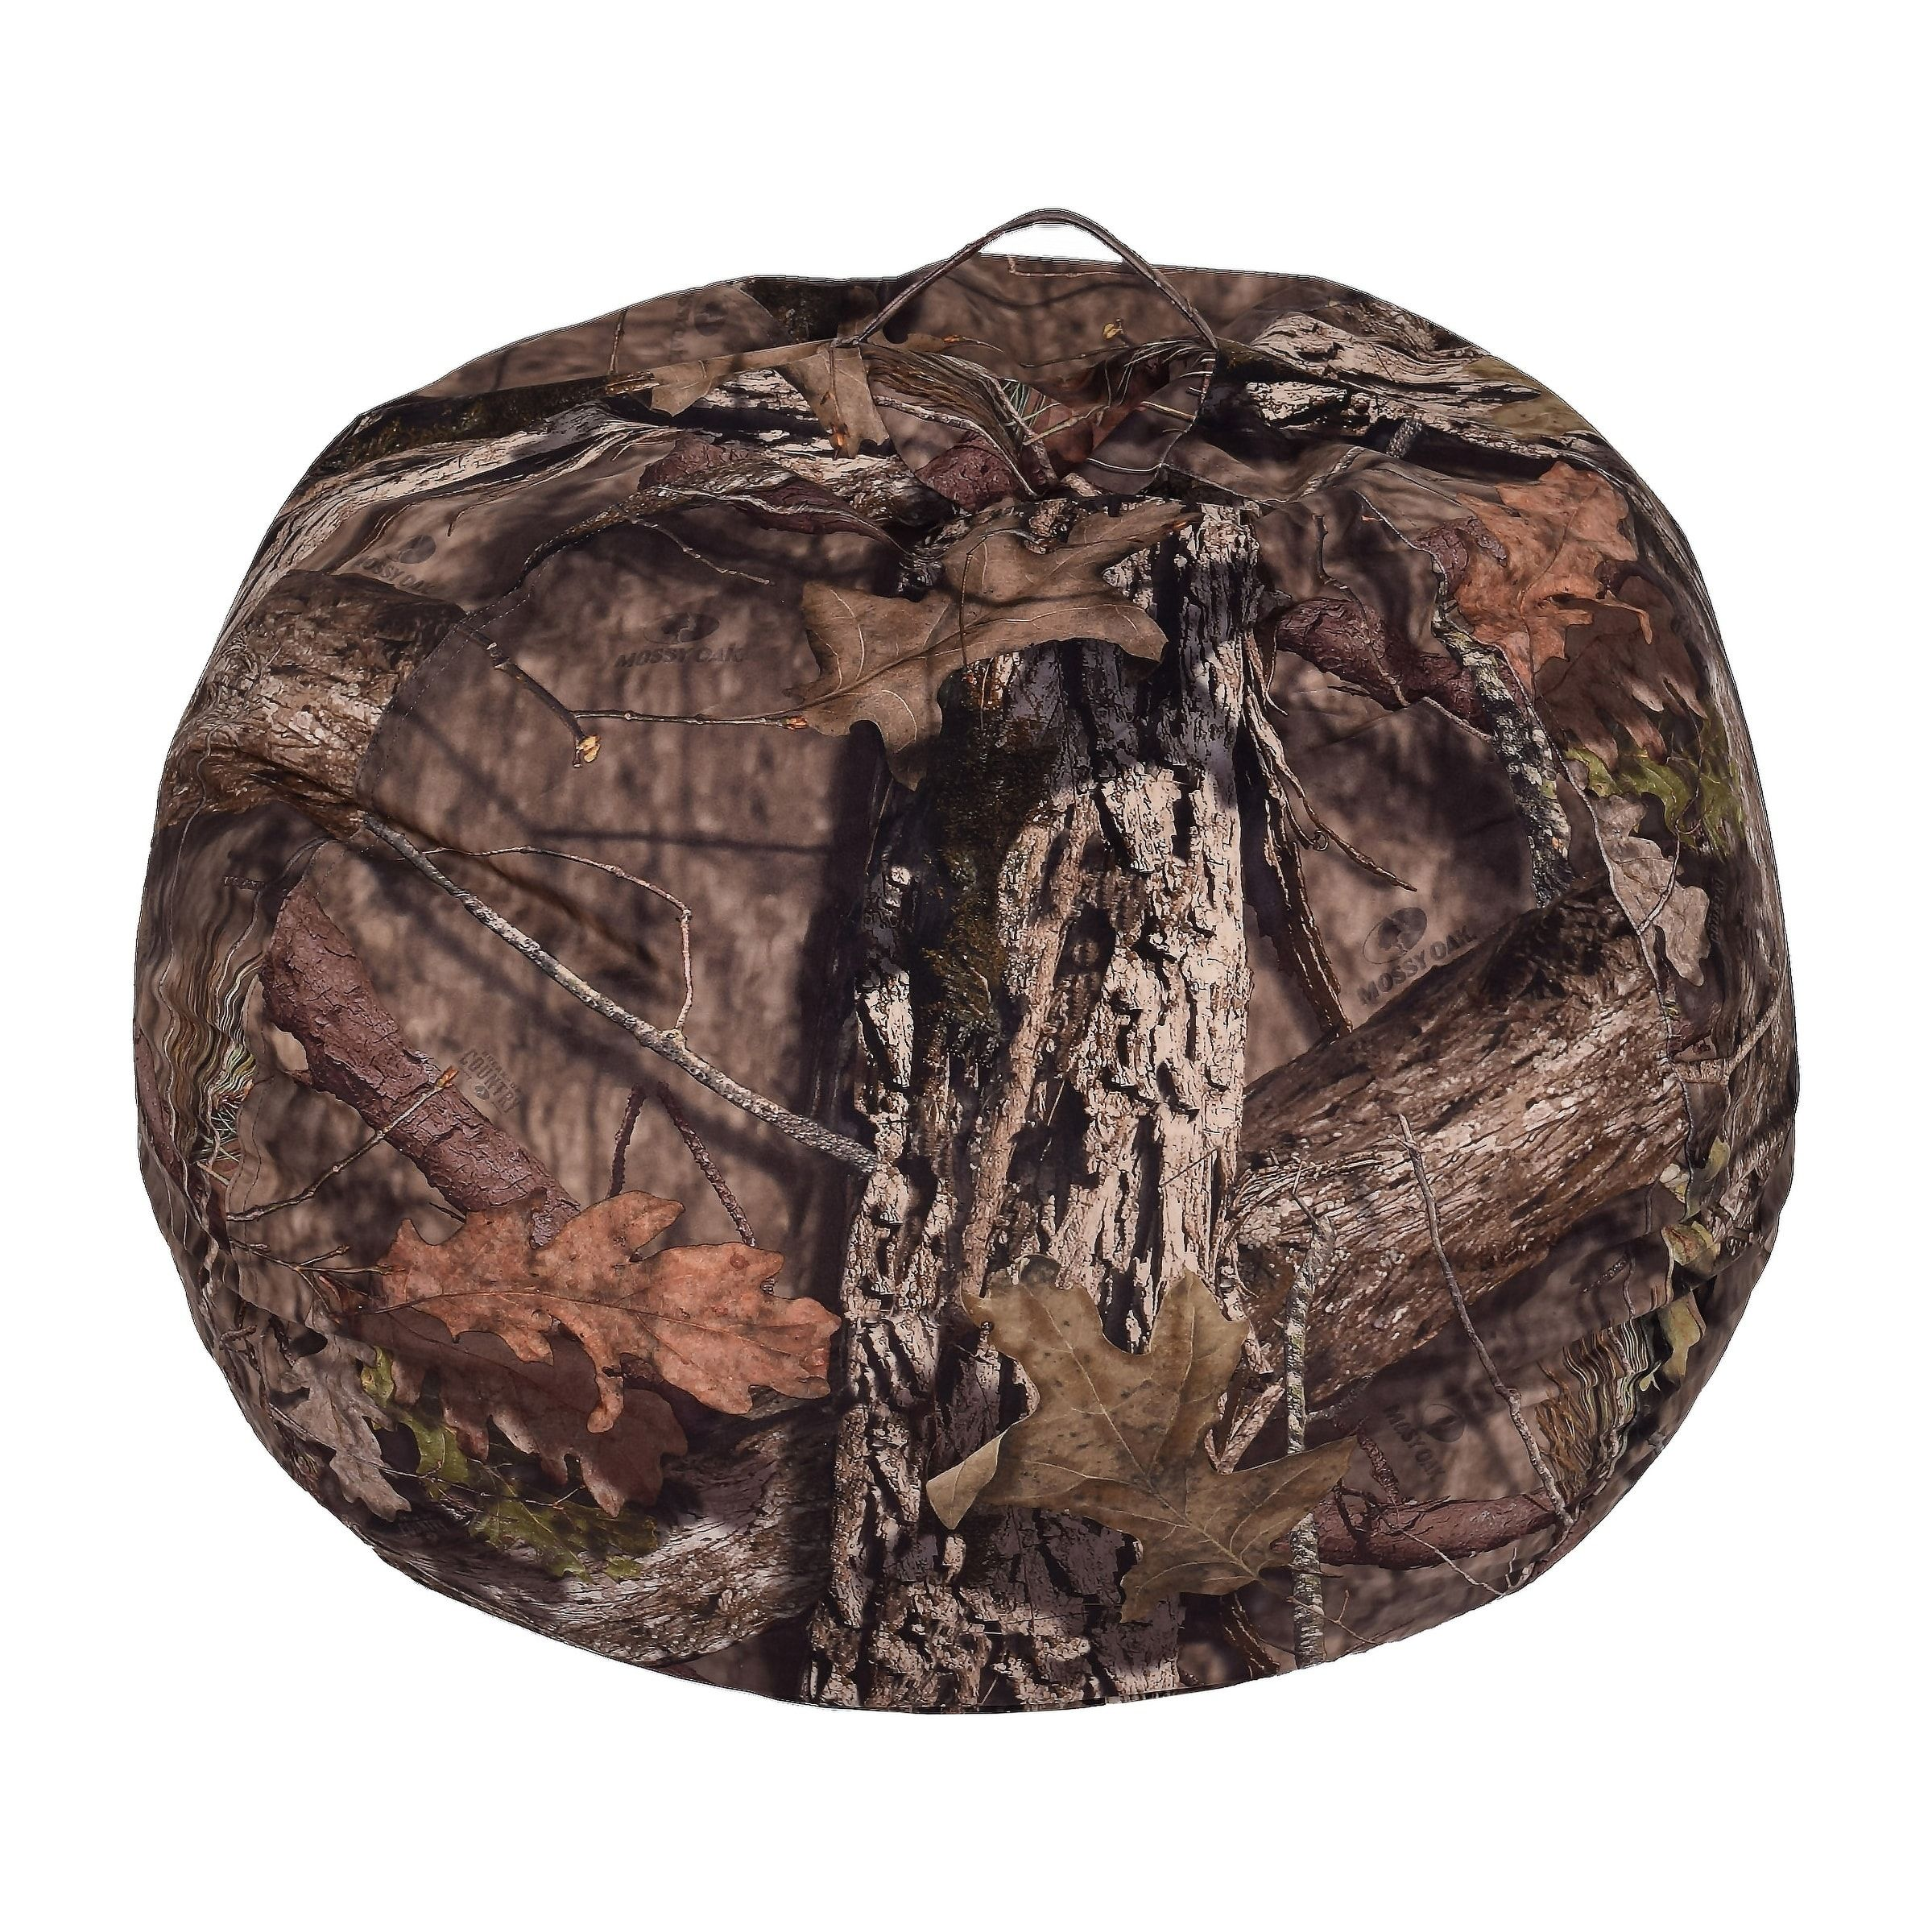 Mossy Oak Brown Bean Bag Xlarge Size Jumbo Fabric Brown Bean